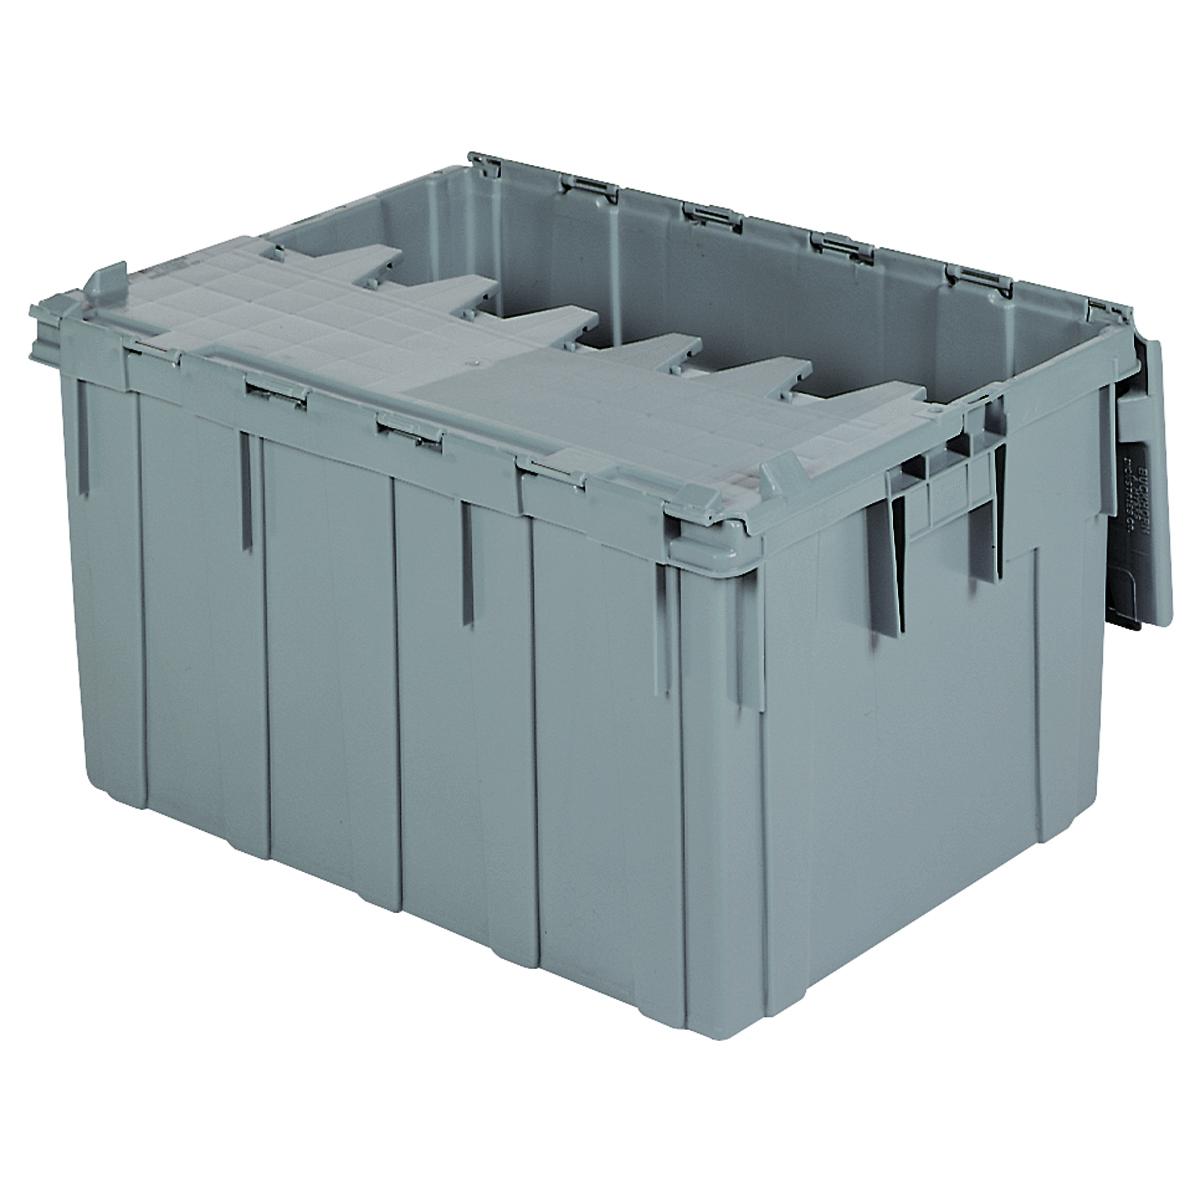 Akro mils Stackable Plastic Storage Bins Storage Cabinets